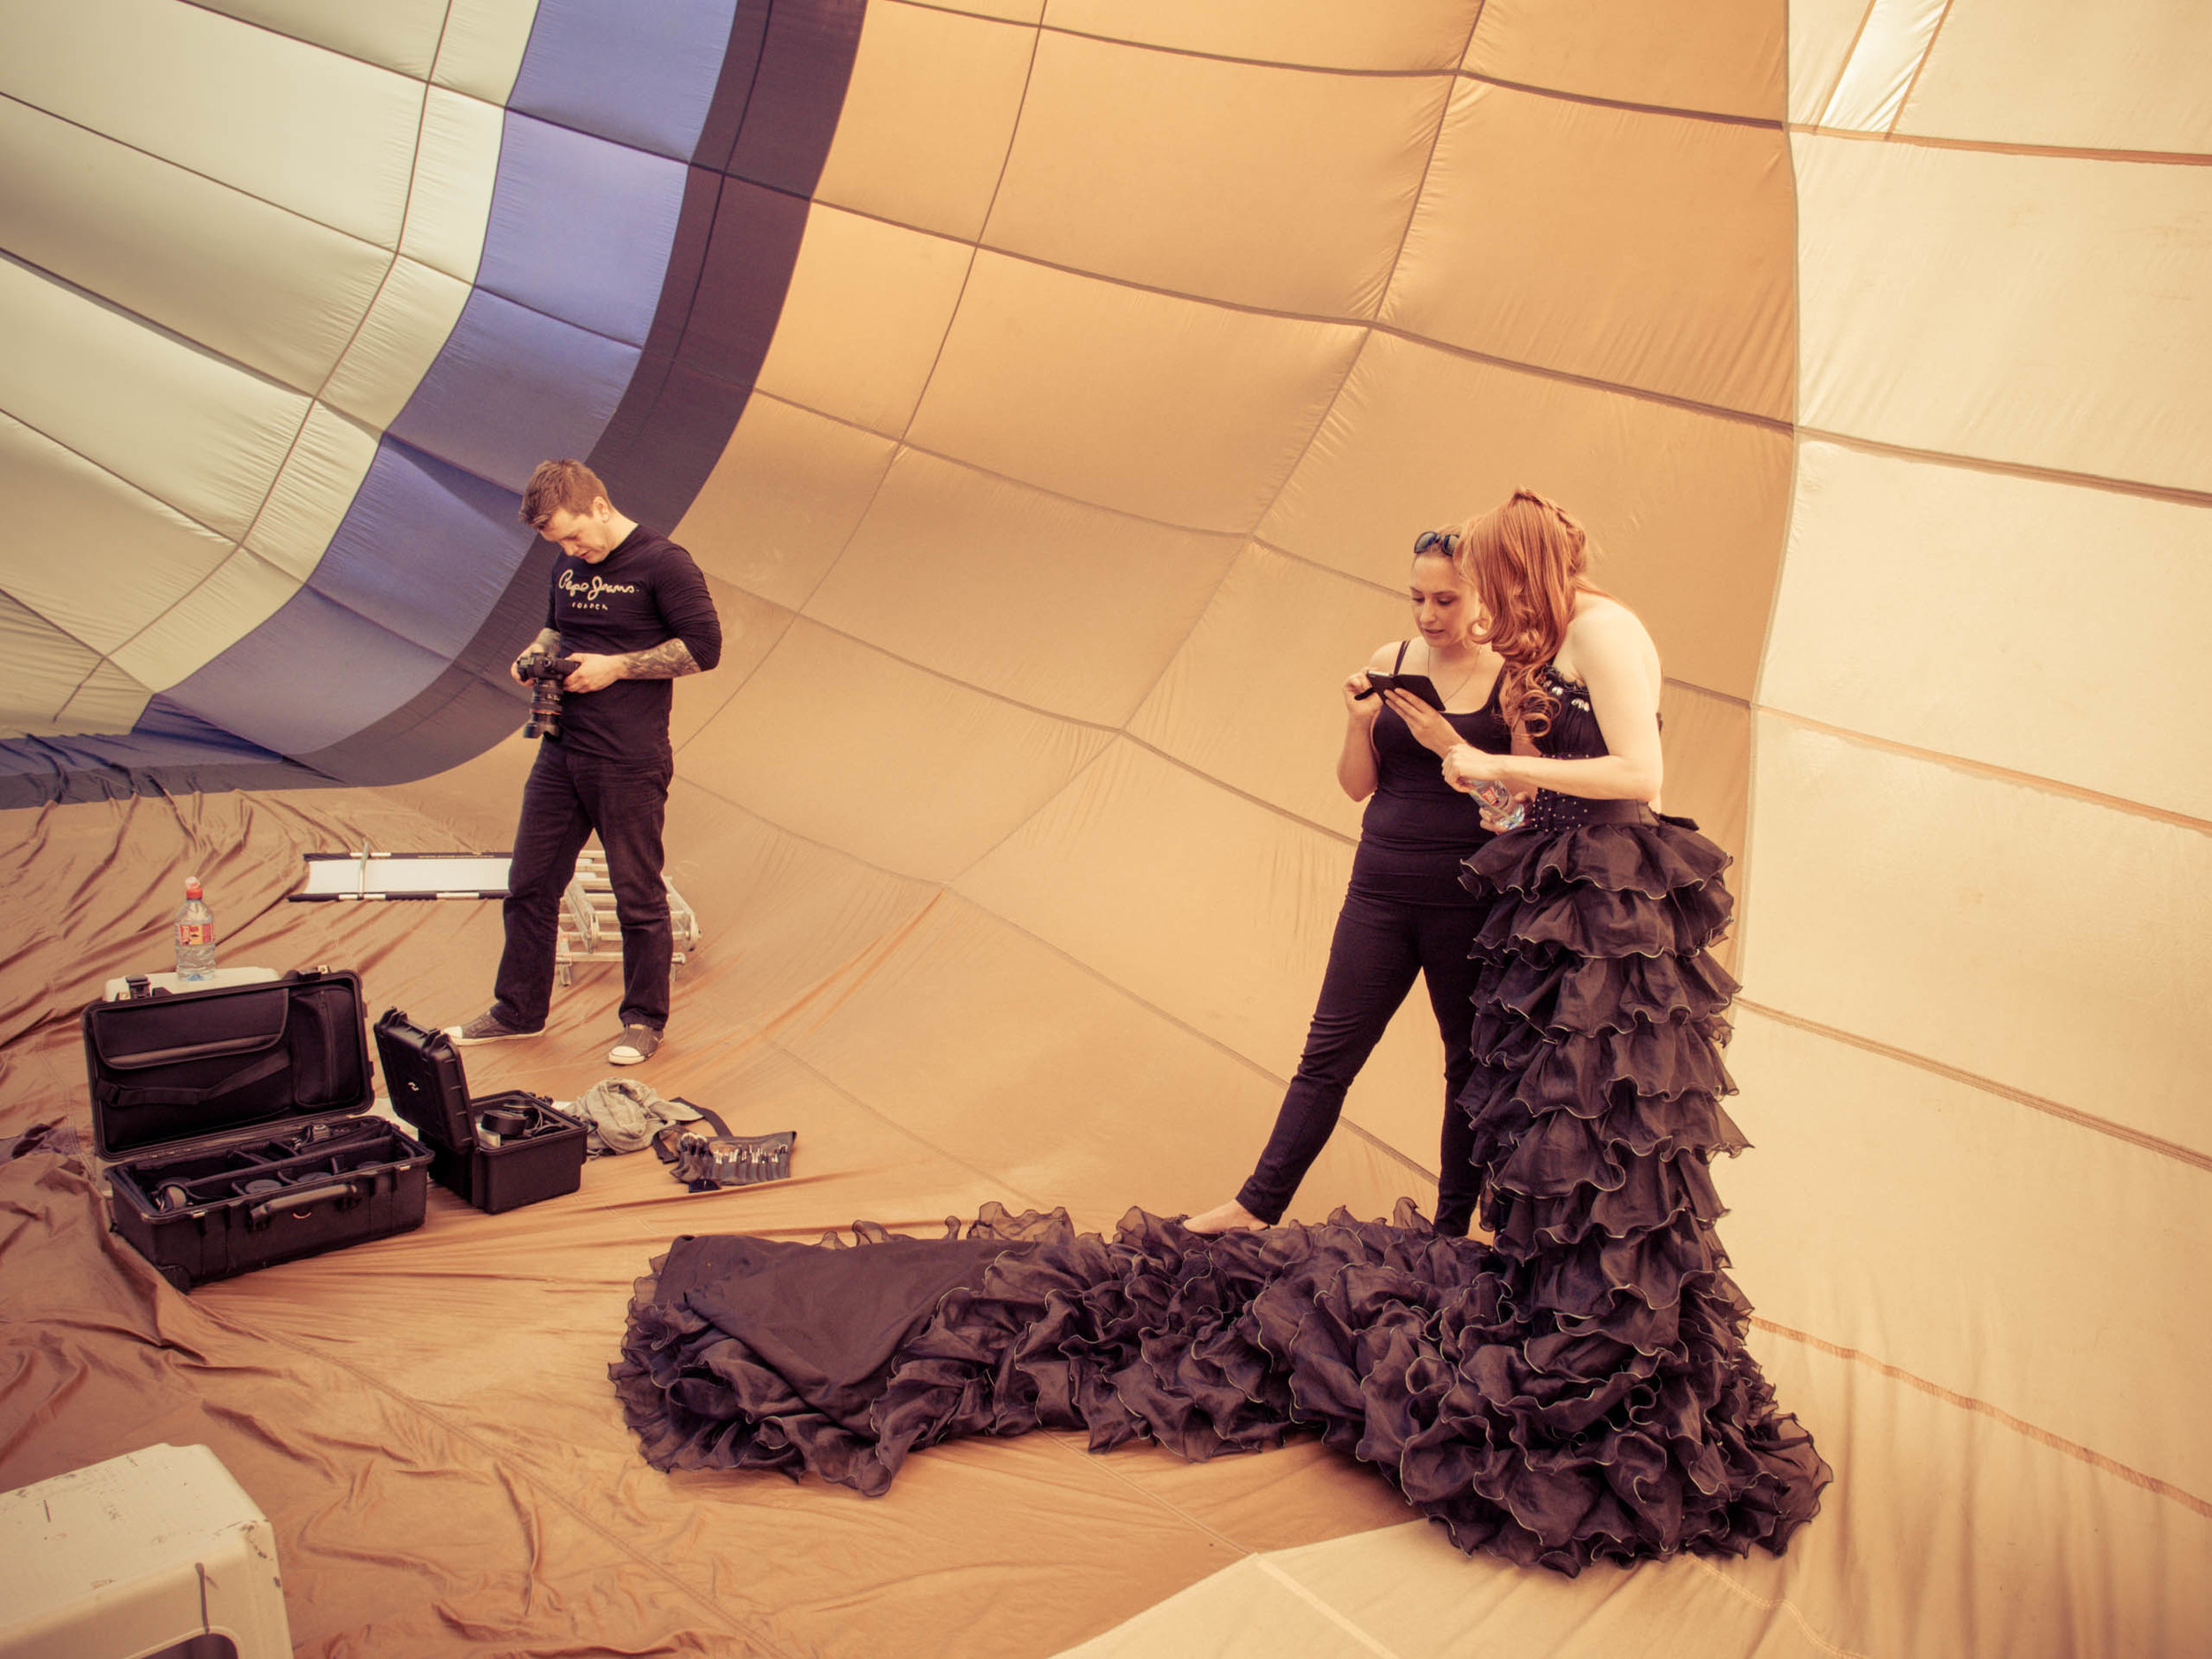 Heisslufballon_OMD-212.jpg